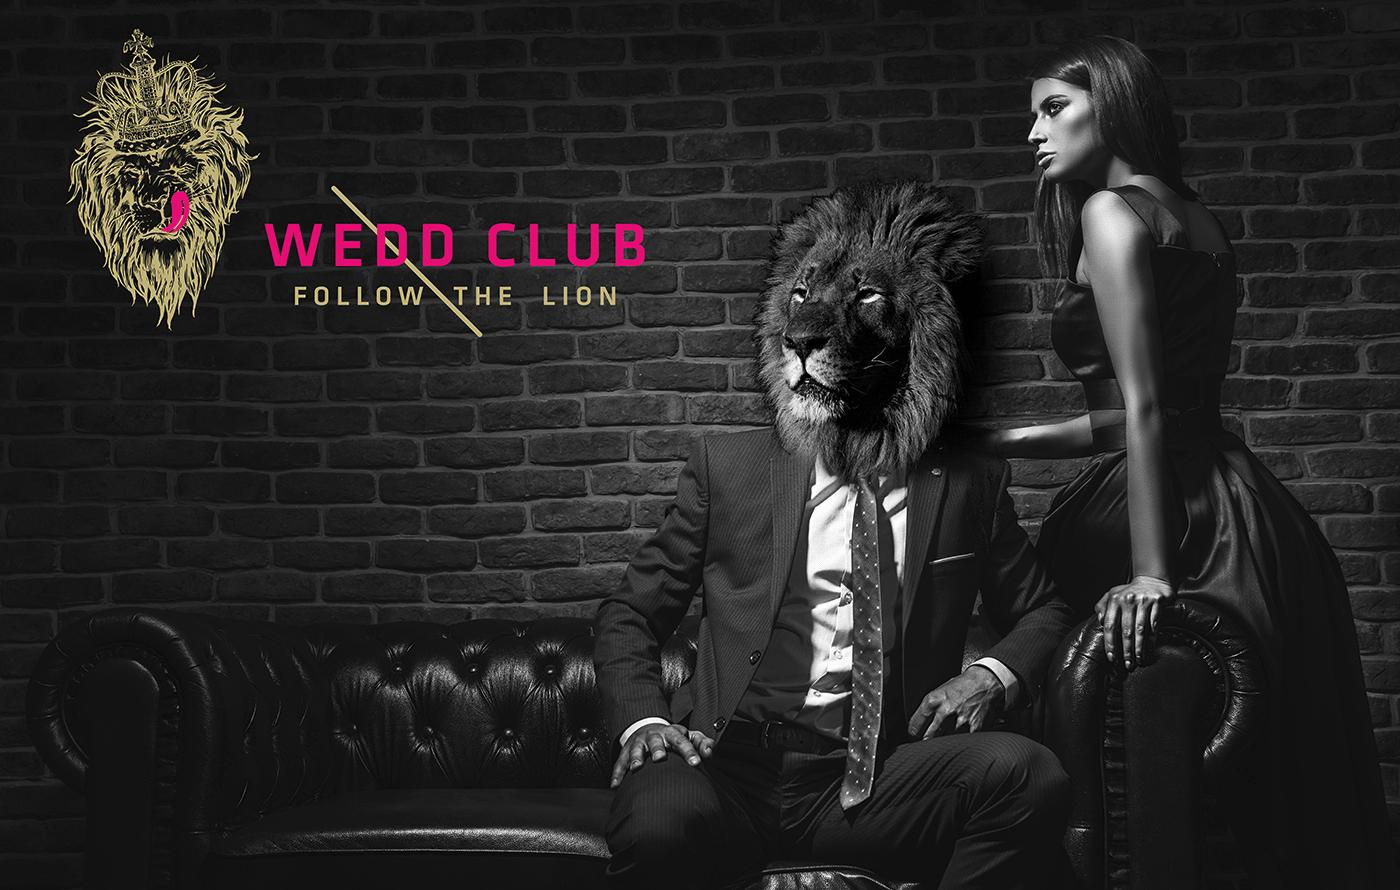 social media,facebook,instagram,Corporate Design,logo,lion,party,festival,weeding